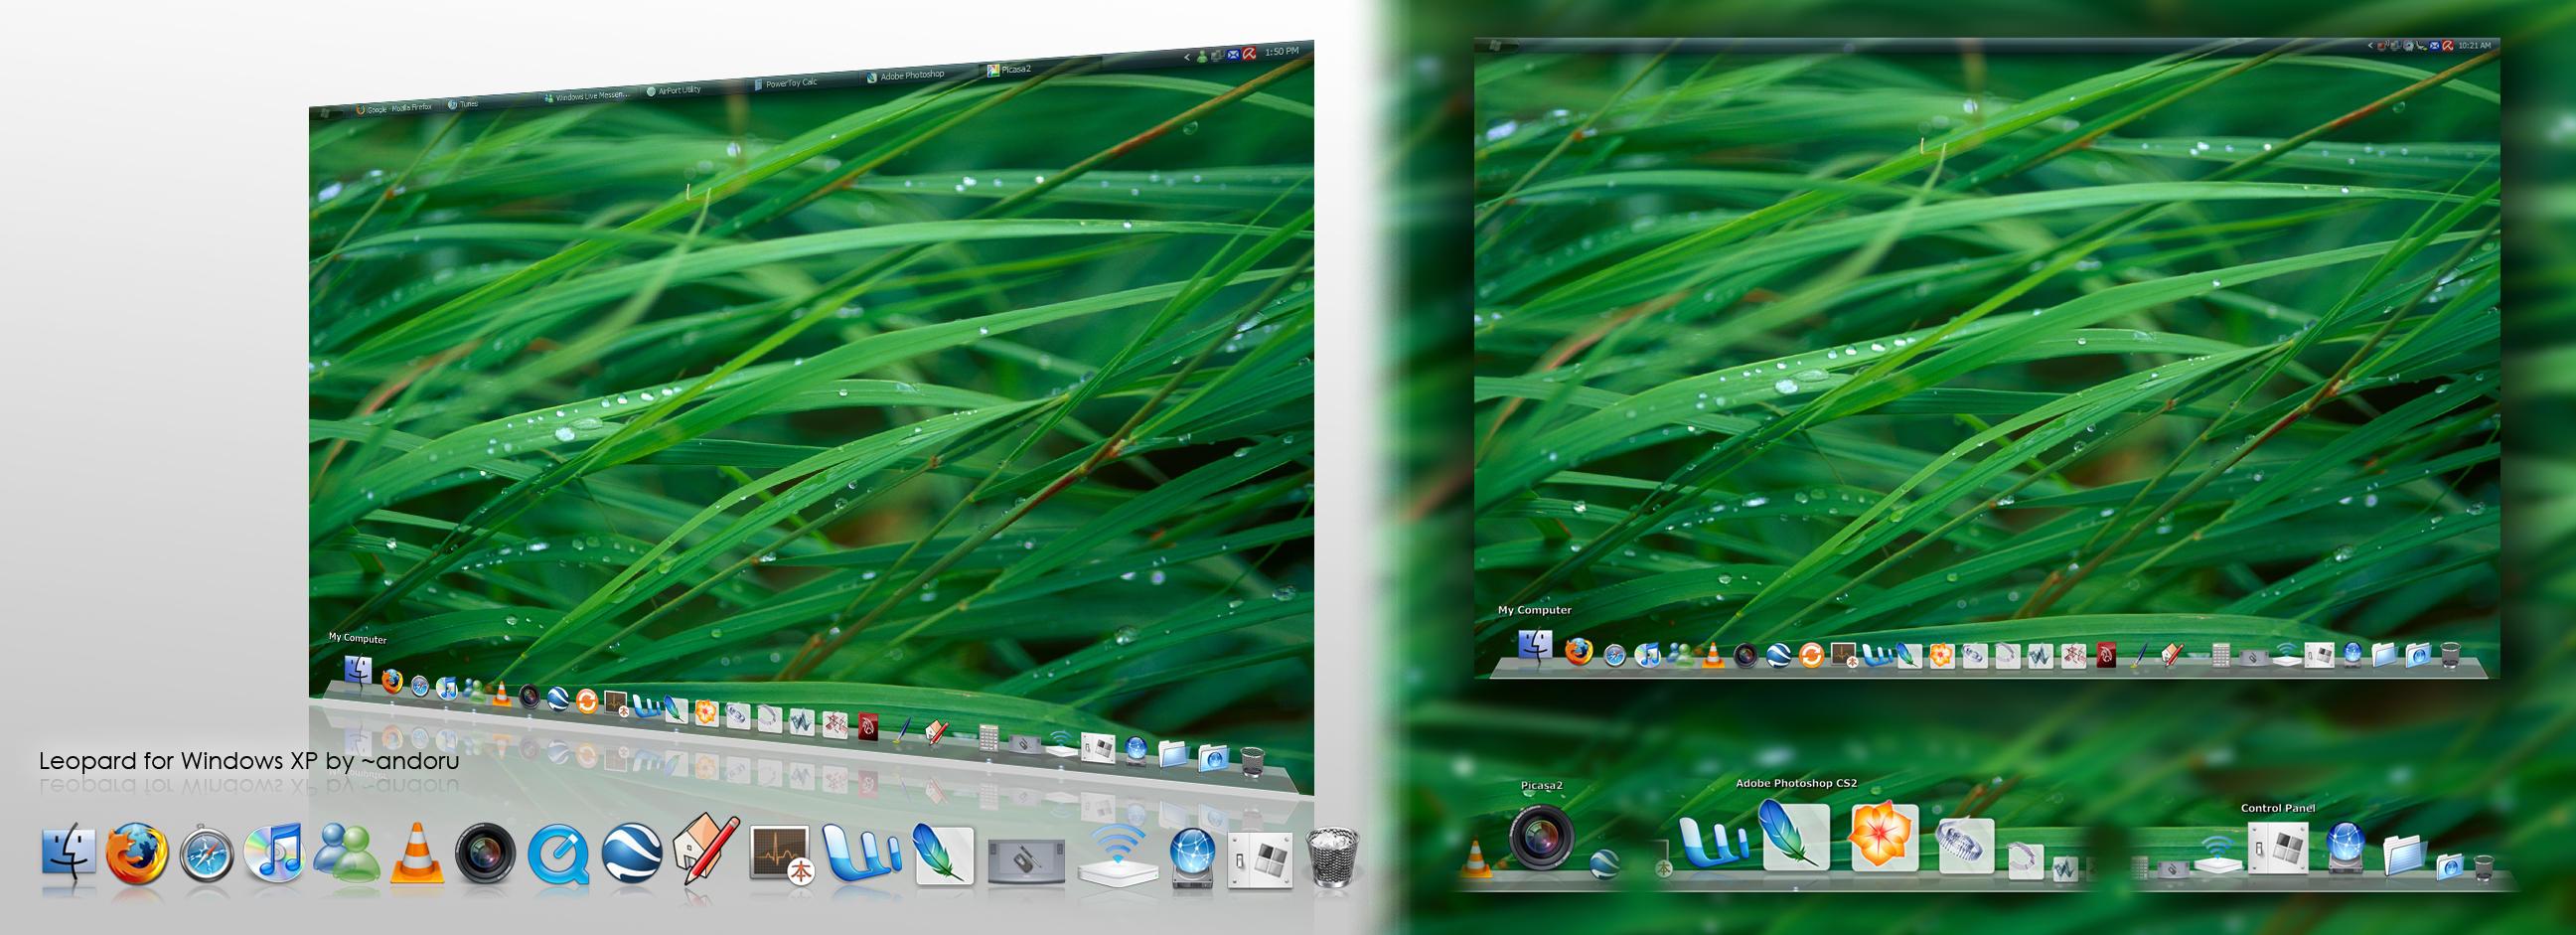 Leopard Dock for Windows XP by andoruhaku